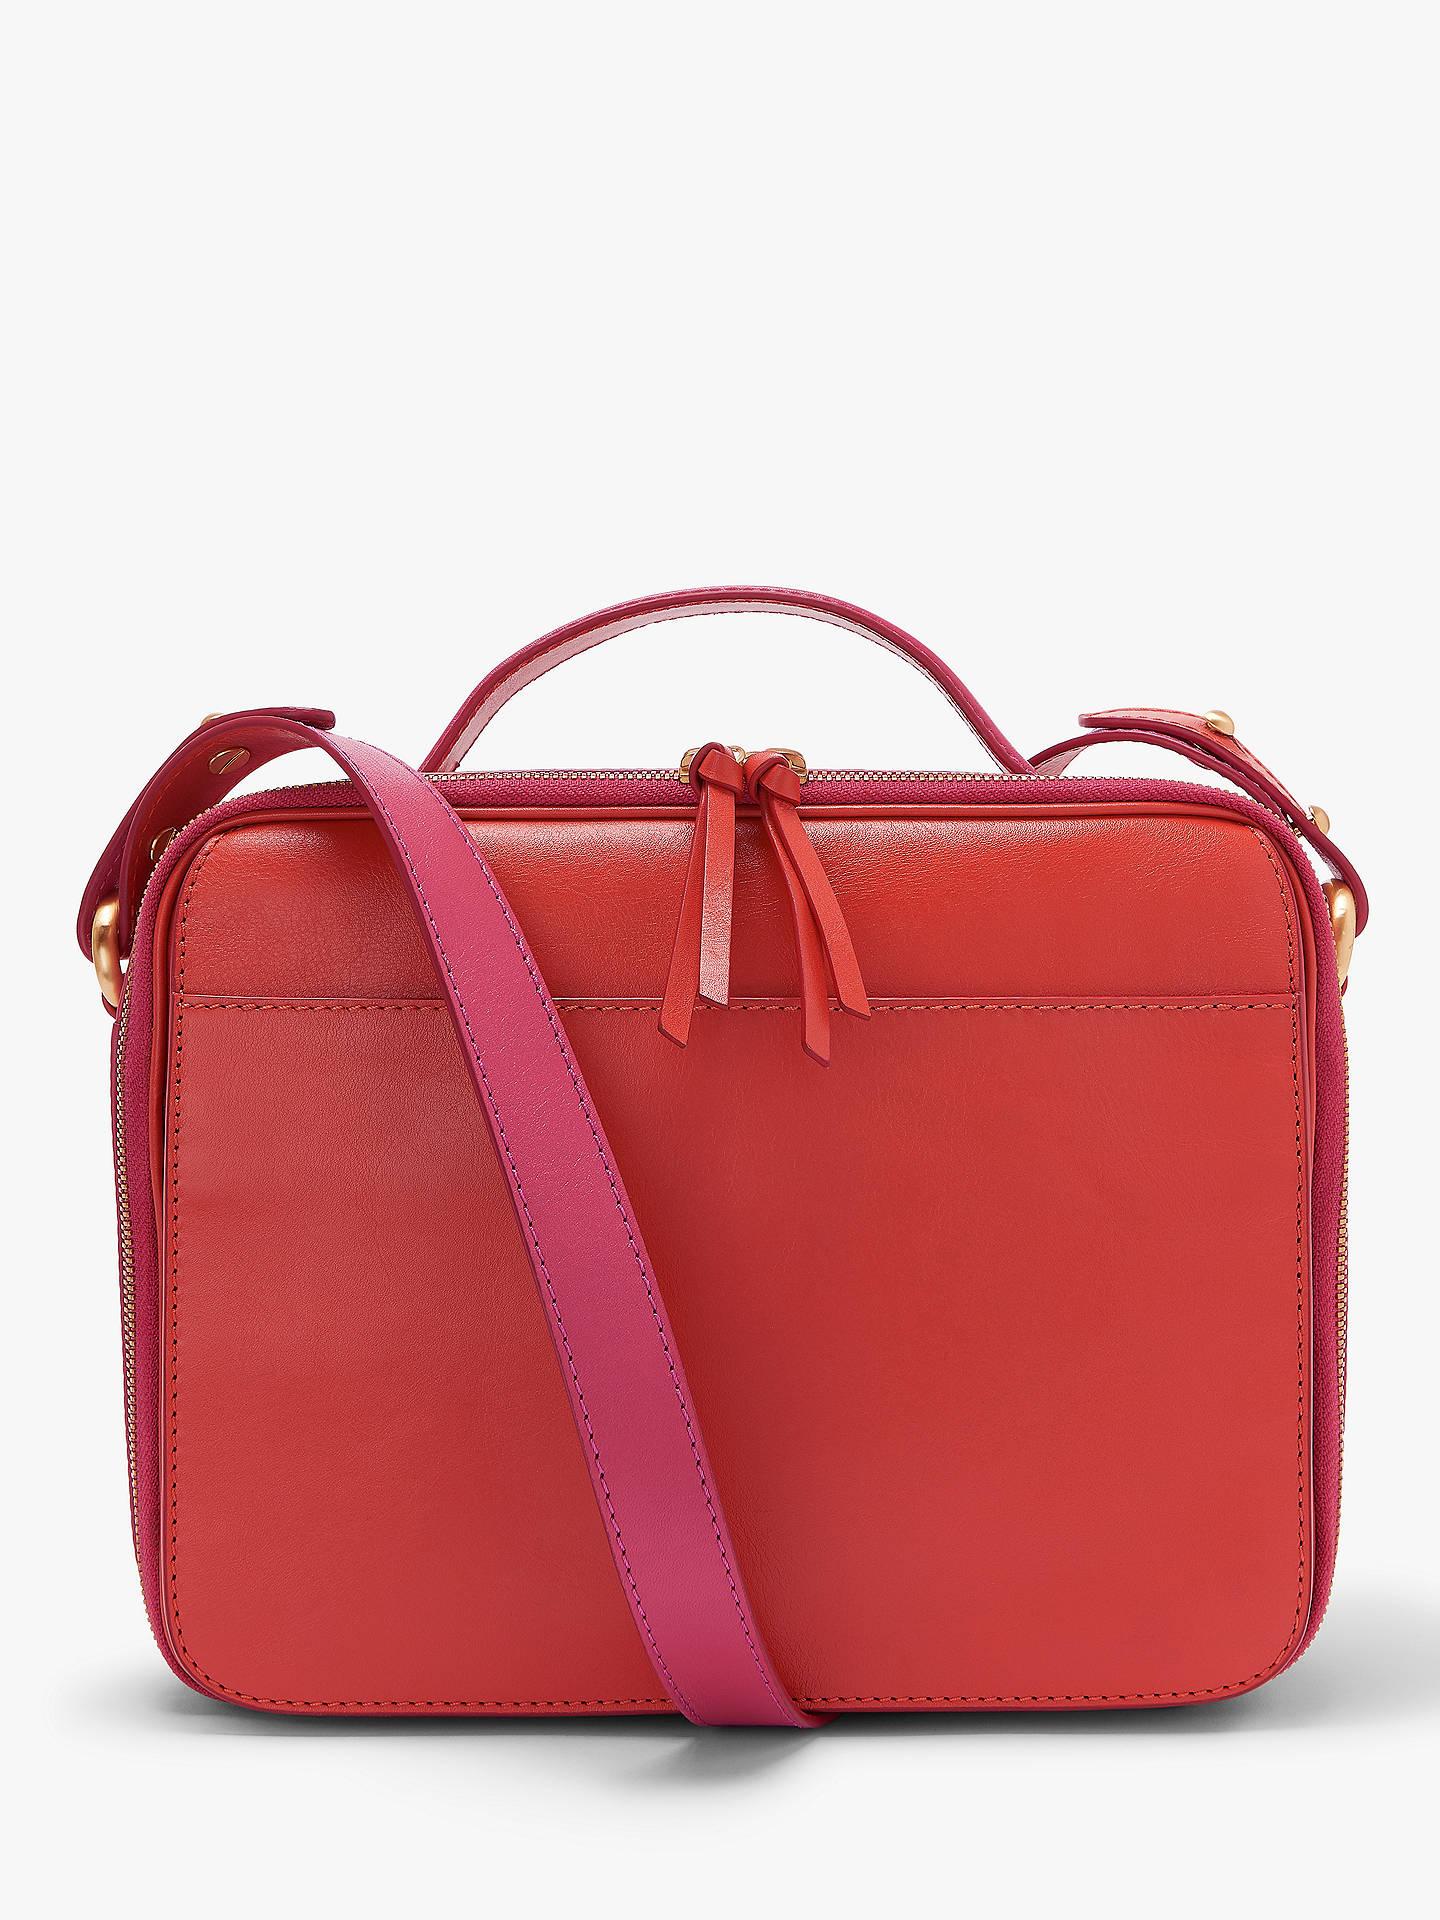 2c04f6a19f Previous Image Next Image. Buy John Lewis   Partners Aida Leather Box Shoulder  Bag